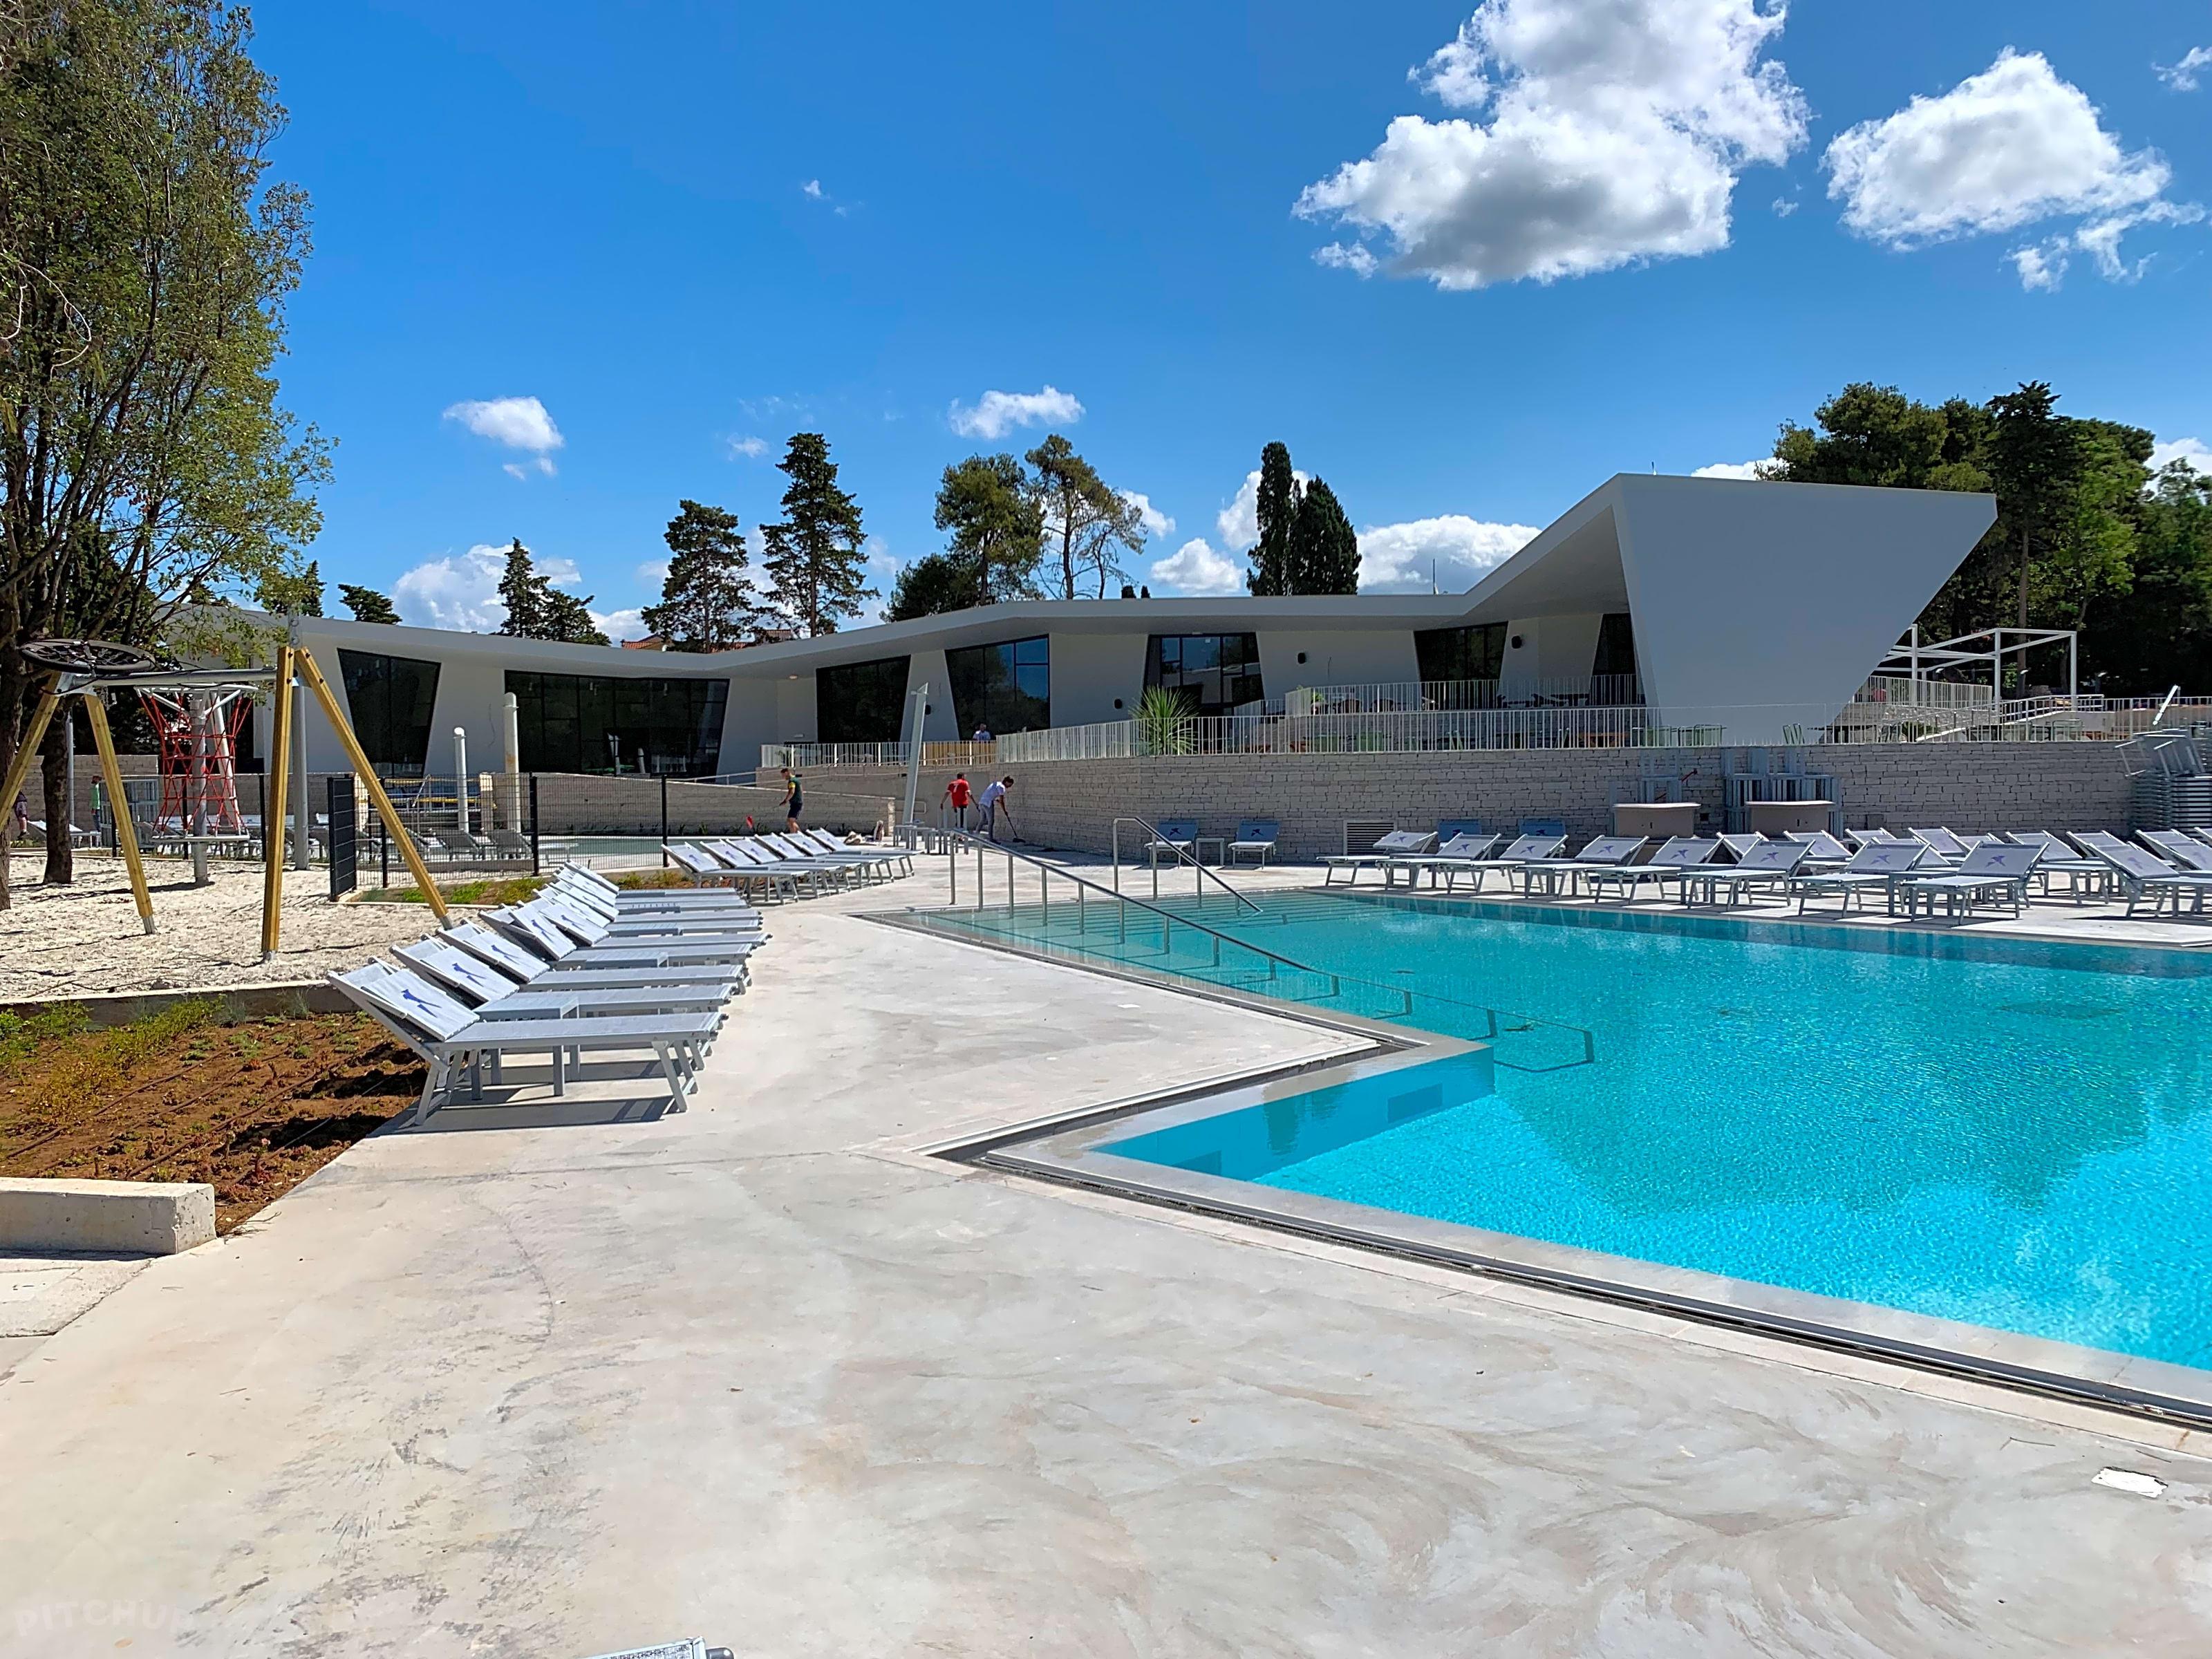 Falkensteiner Premium Camping Zadar, Zadar - Updated 2020 ...